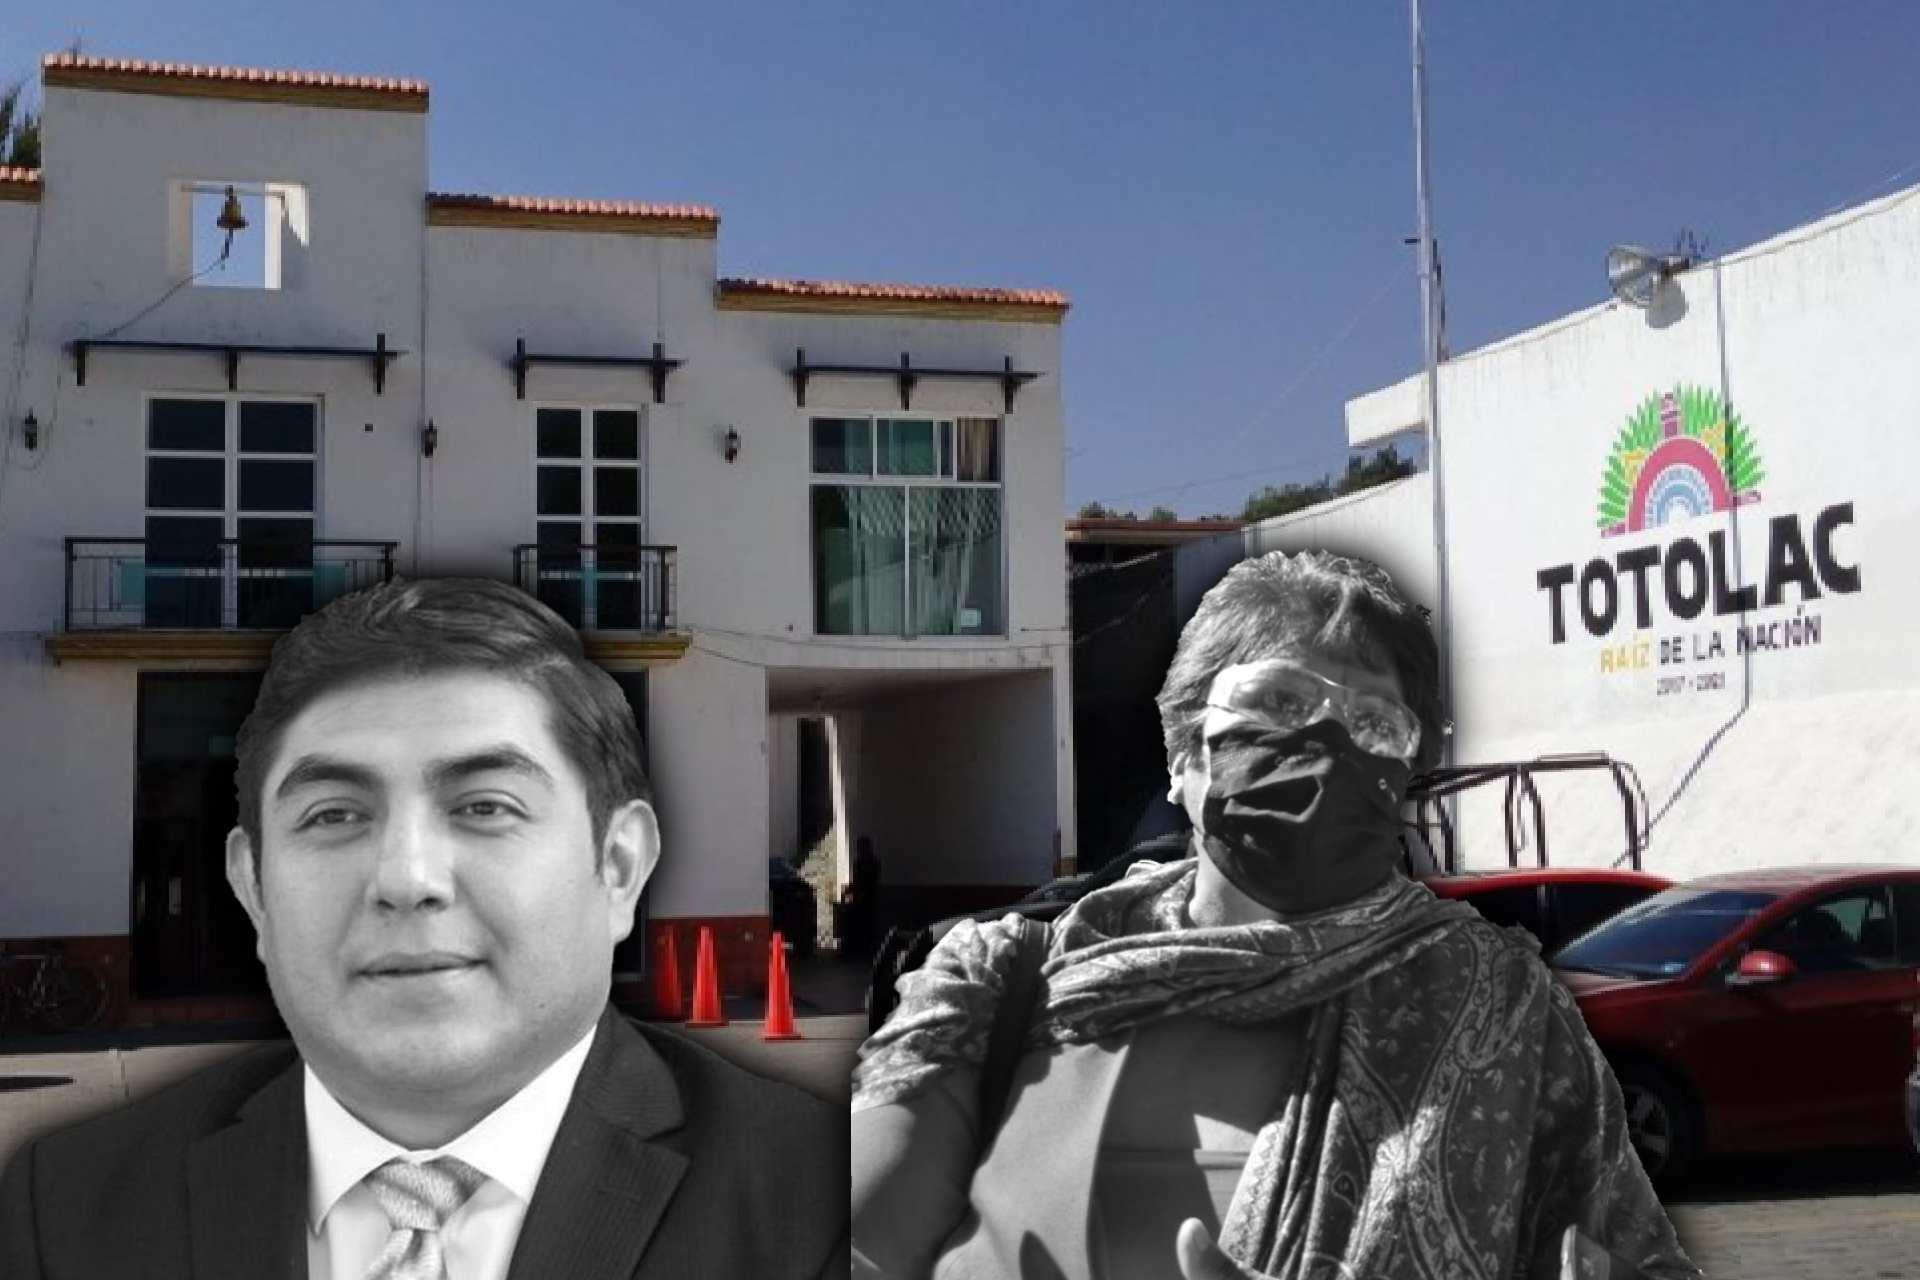 Totolac-Síndico-Irregularidades-Geovanni Pérez Briones